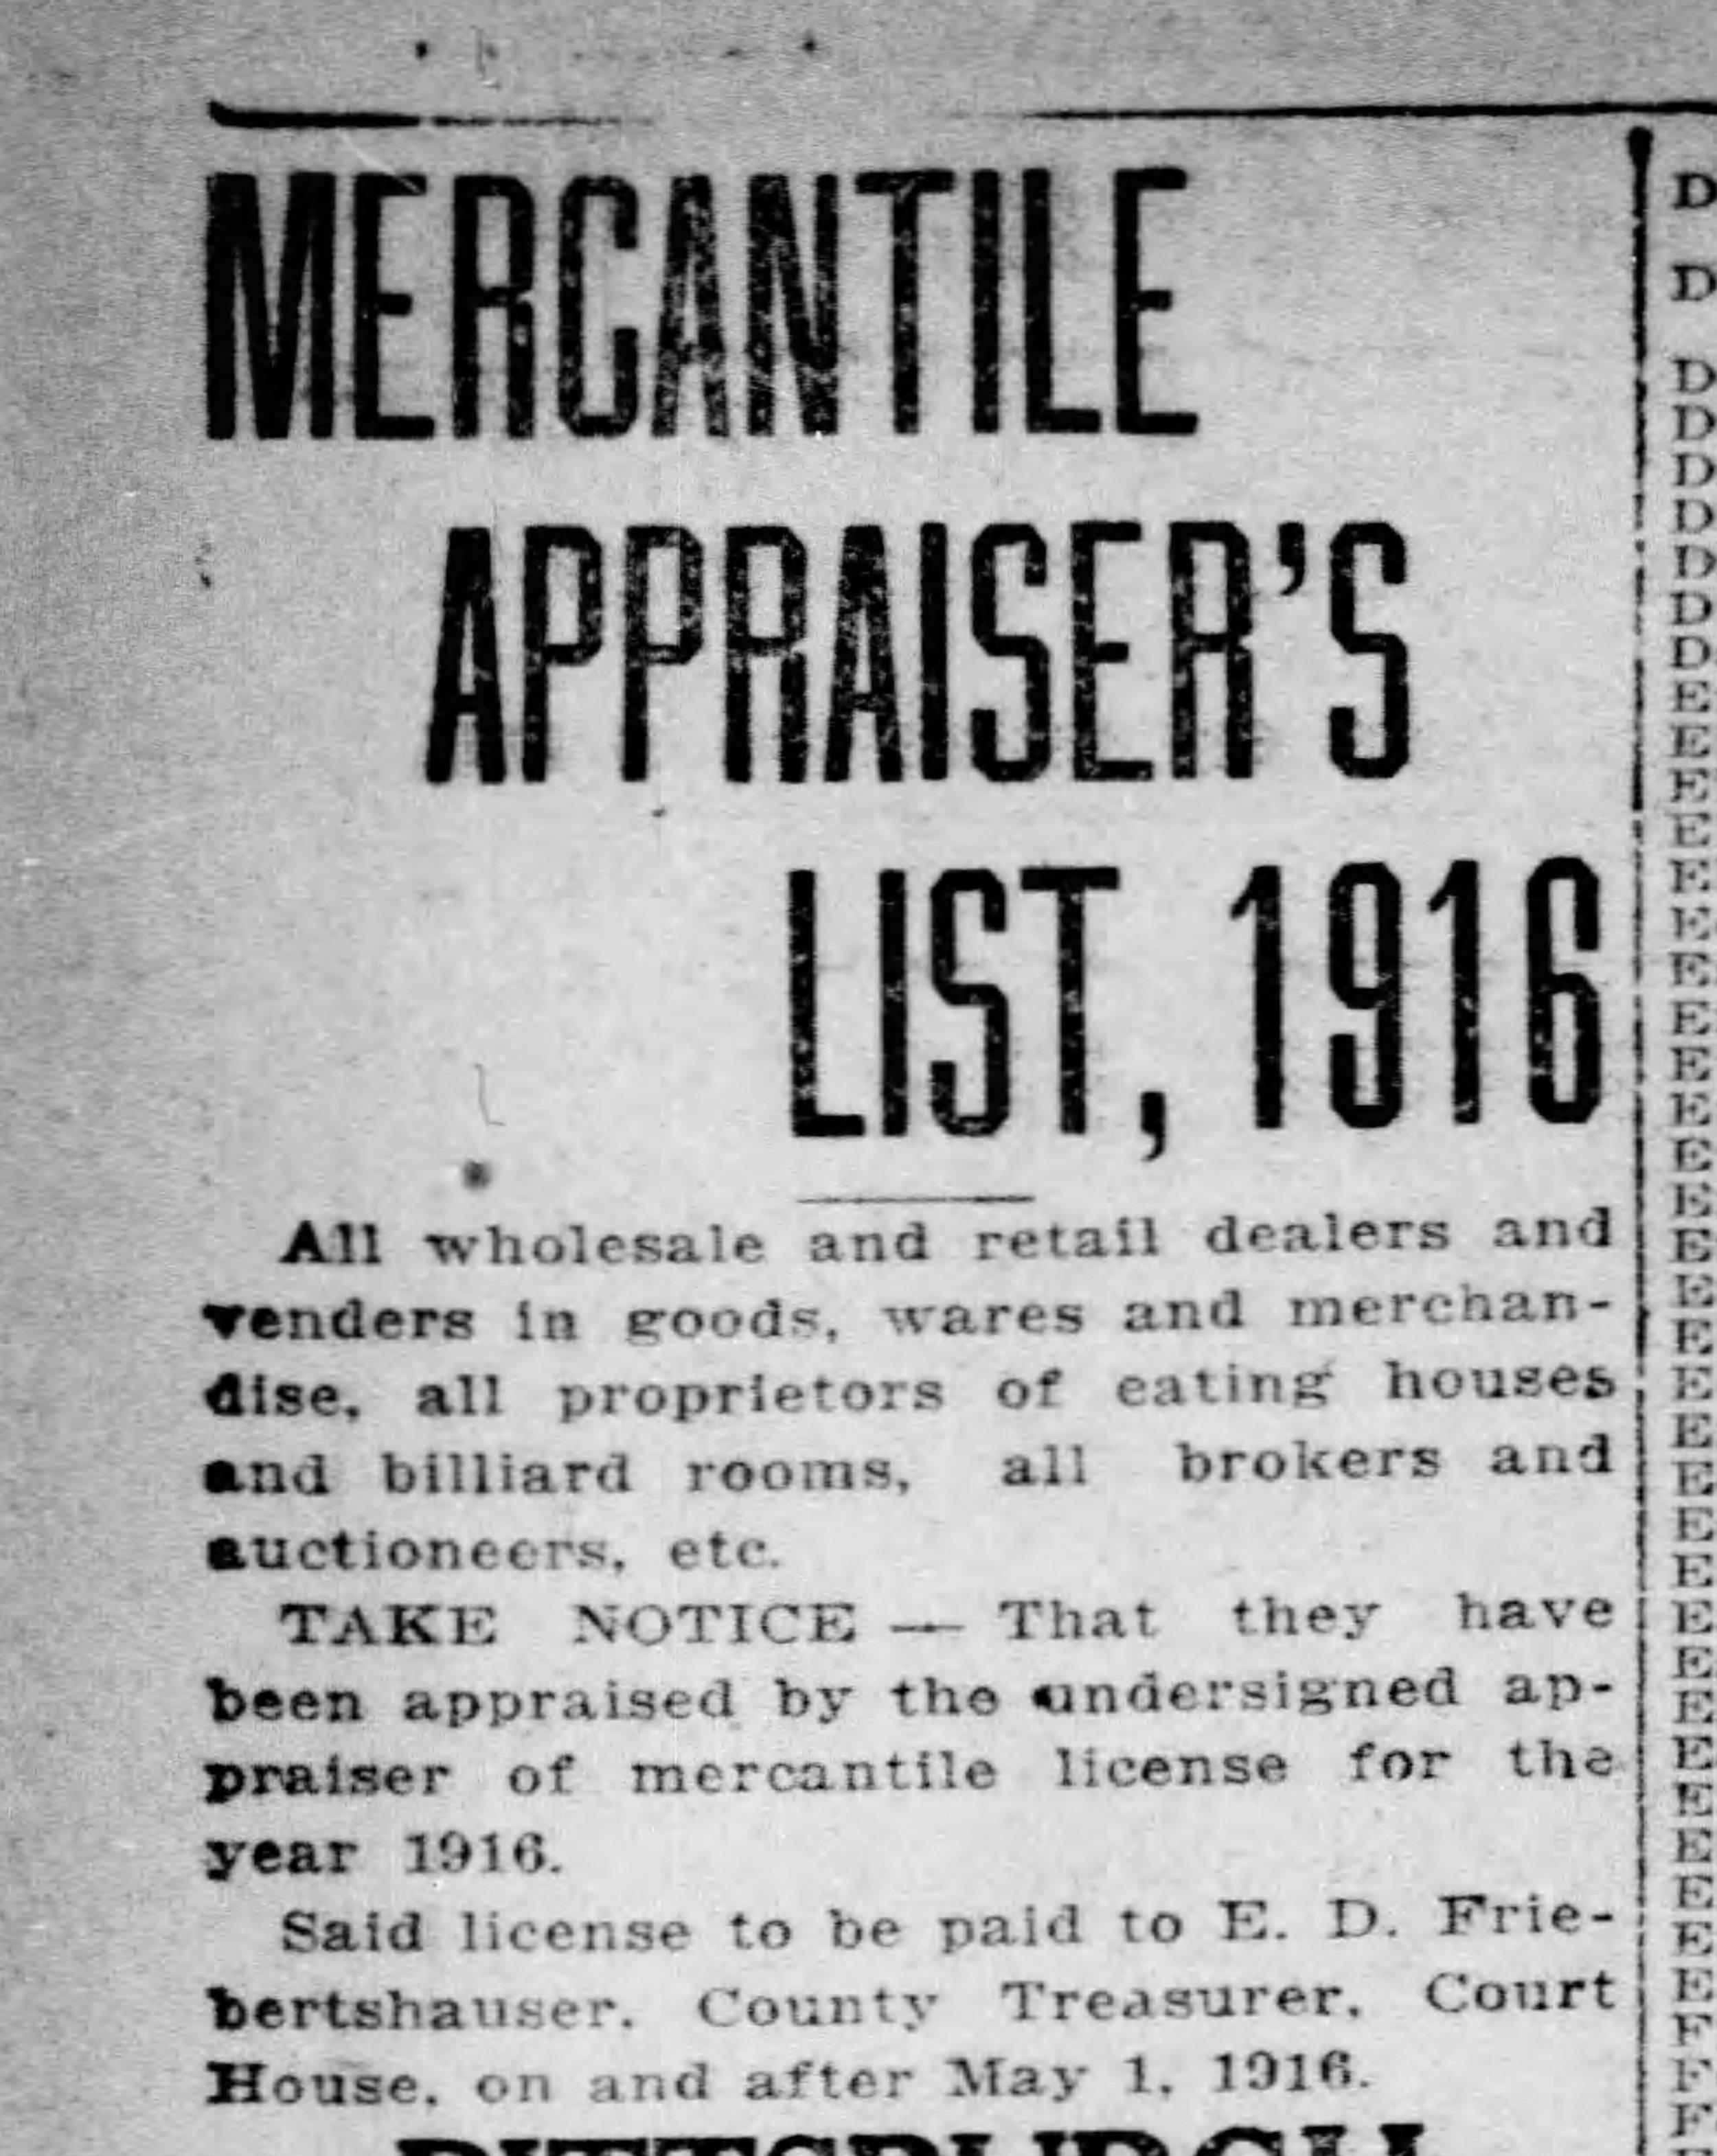 1916 - The_Pittsburgh_Press_Mon__Apr_24__1916_(1).jpg